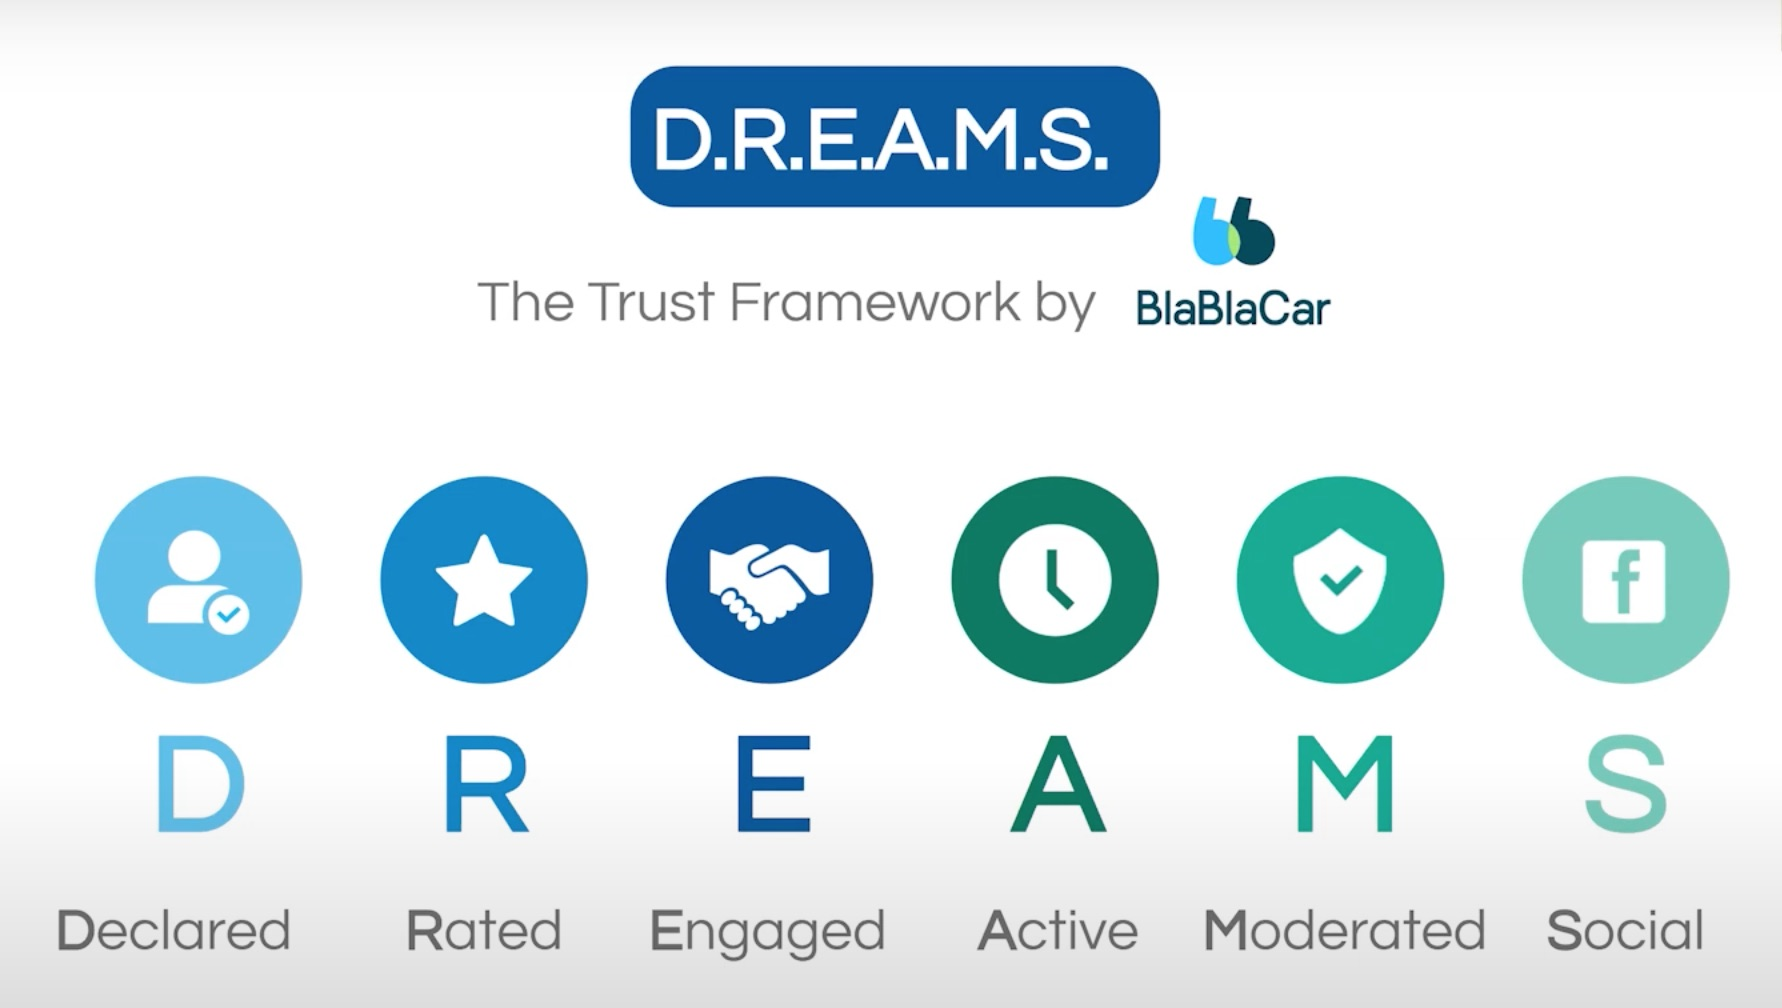 DREAMS framework Frédéric Mazzella BlaBlaCar Platform Leaders 2020